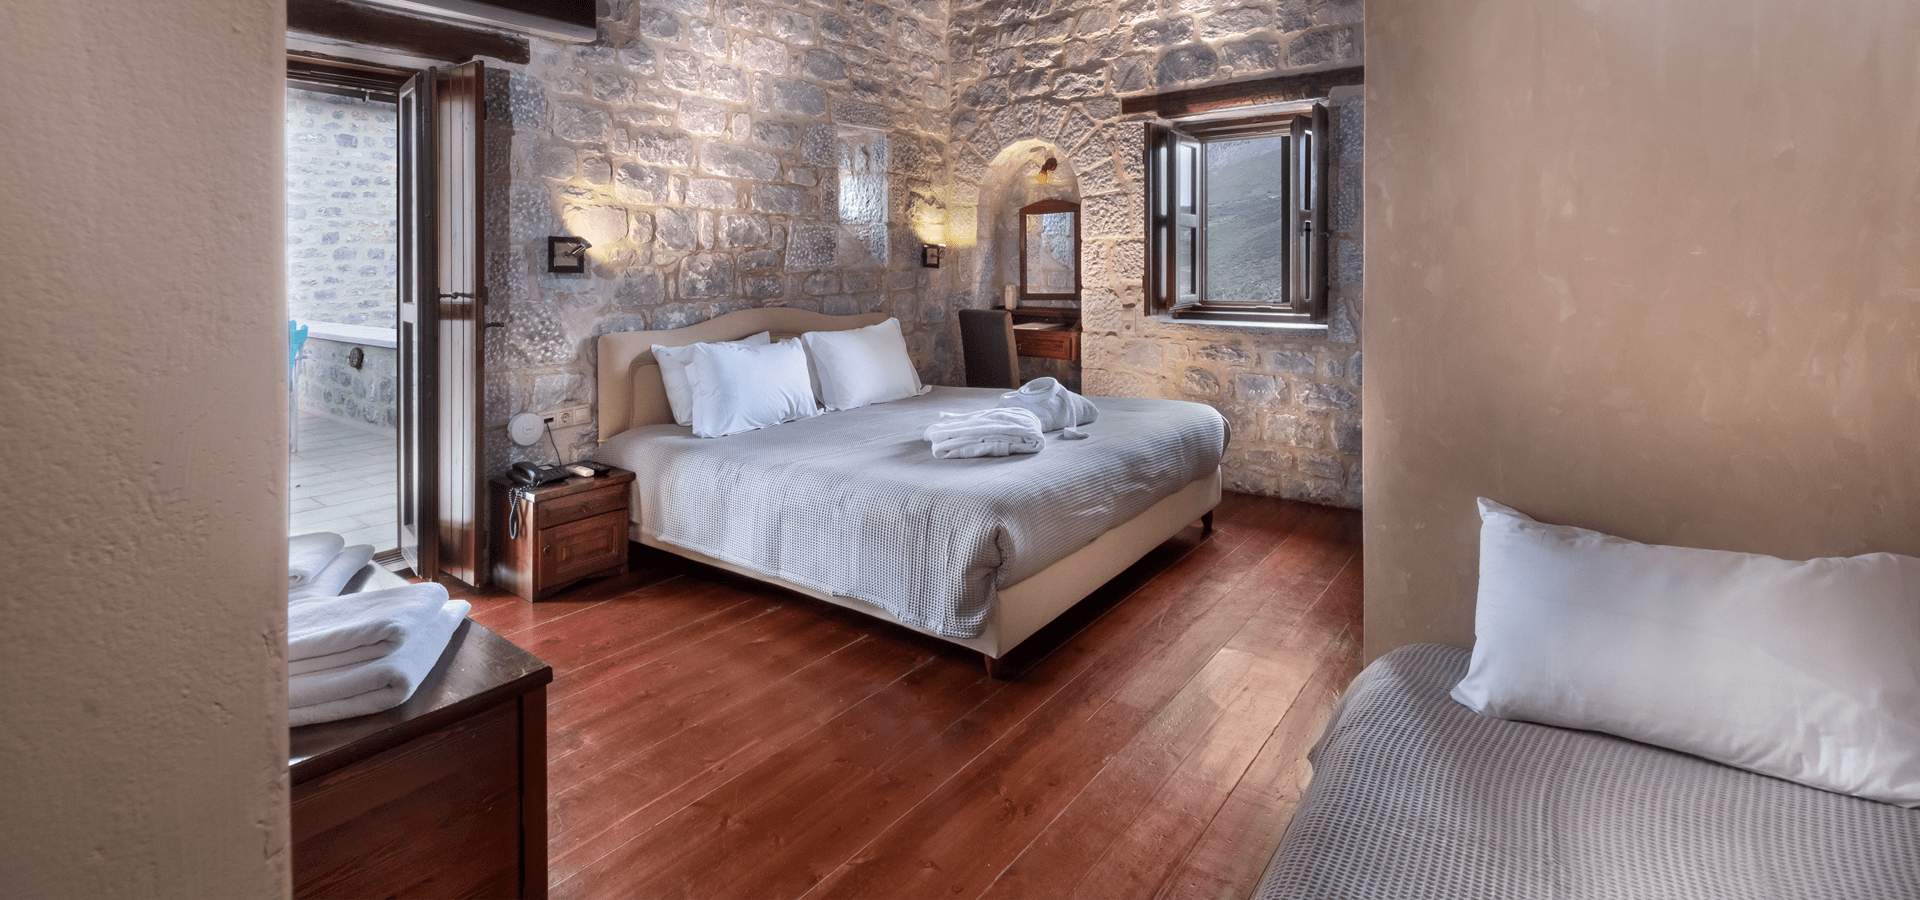 rooms min